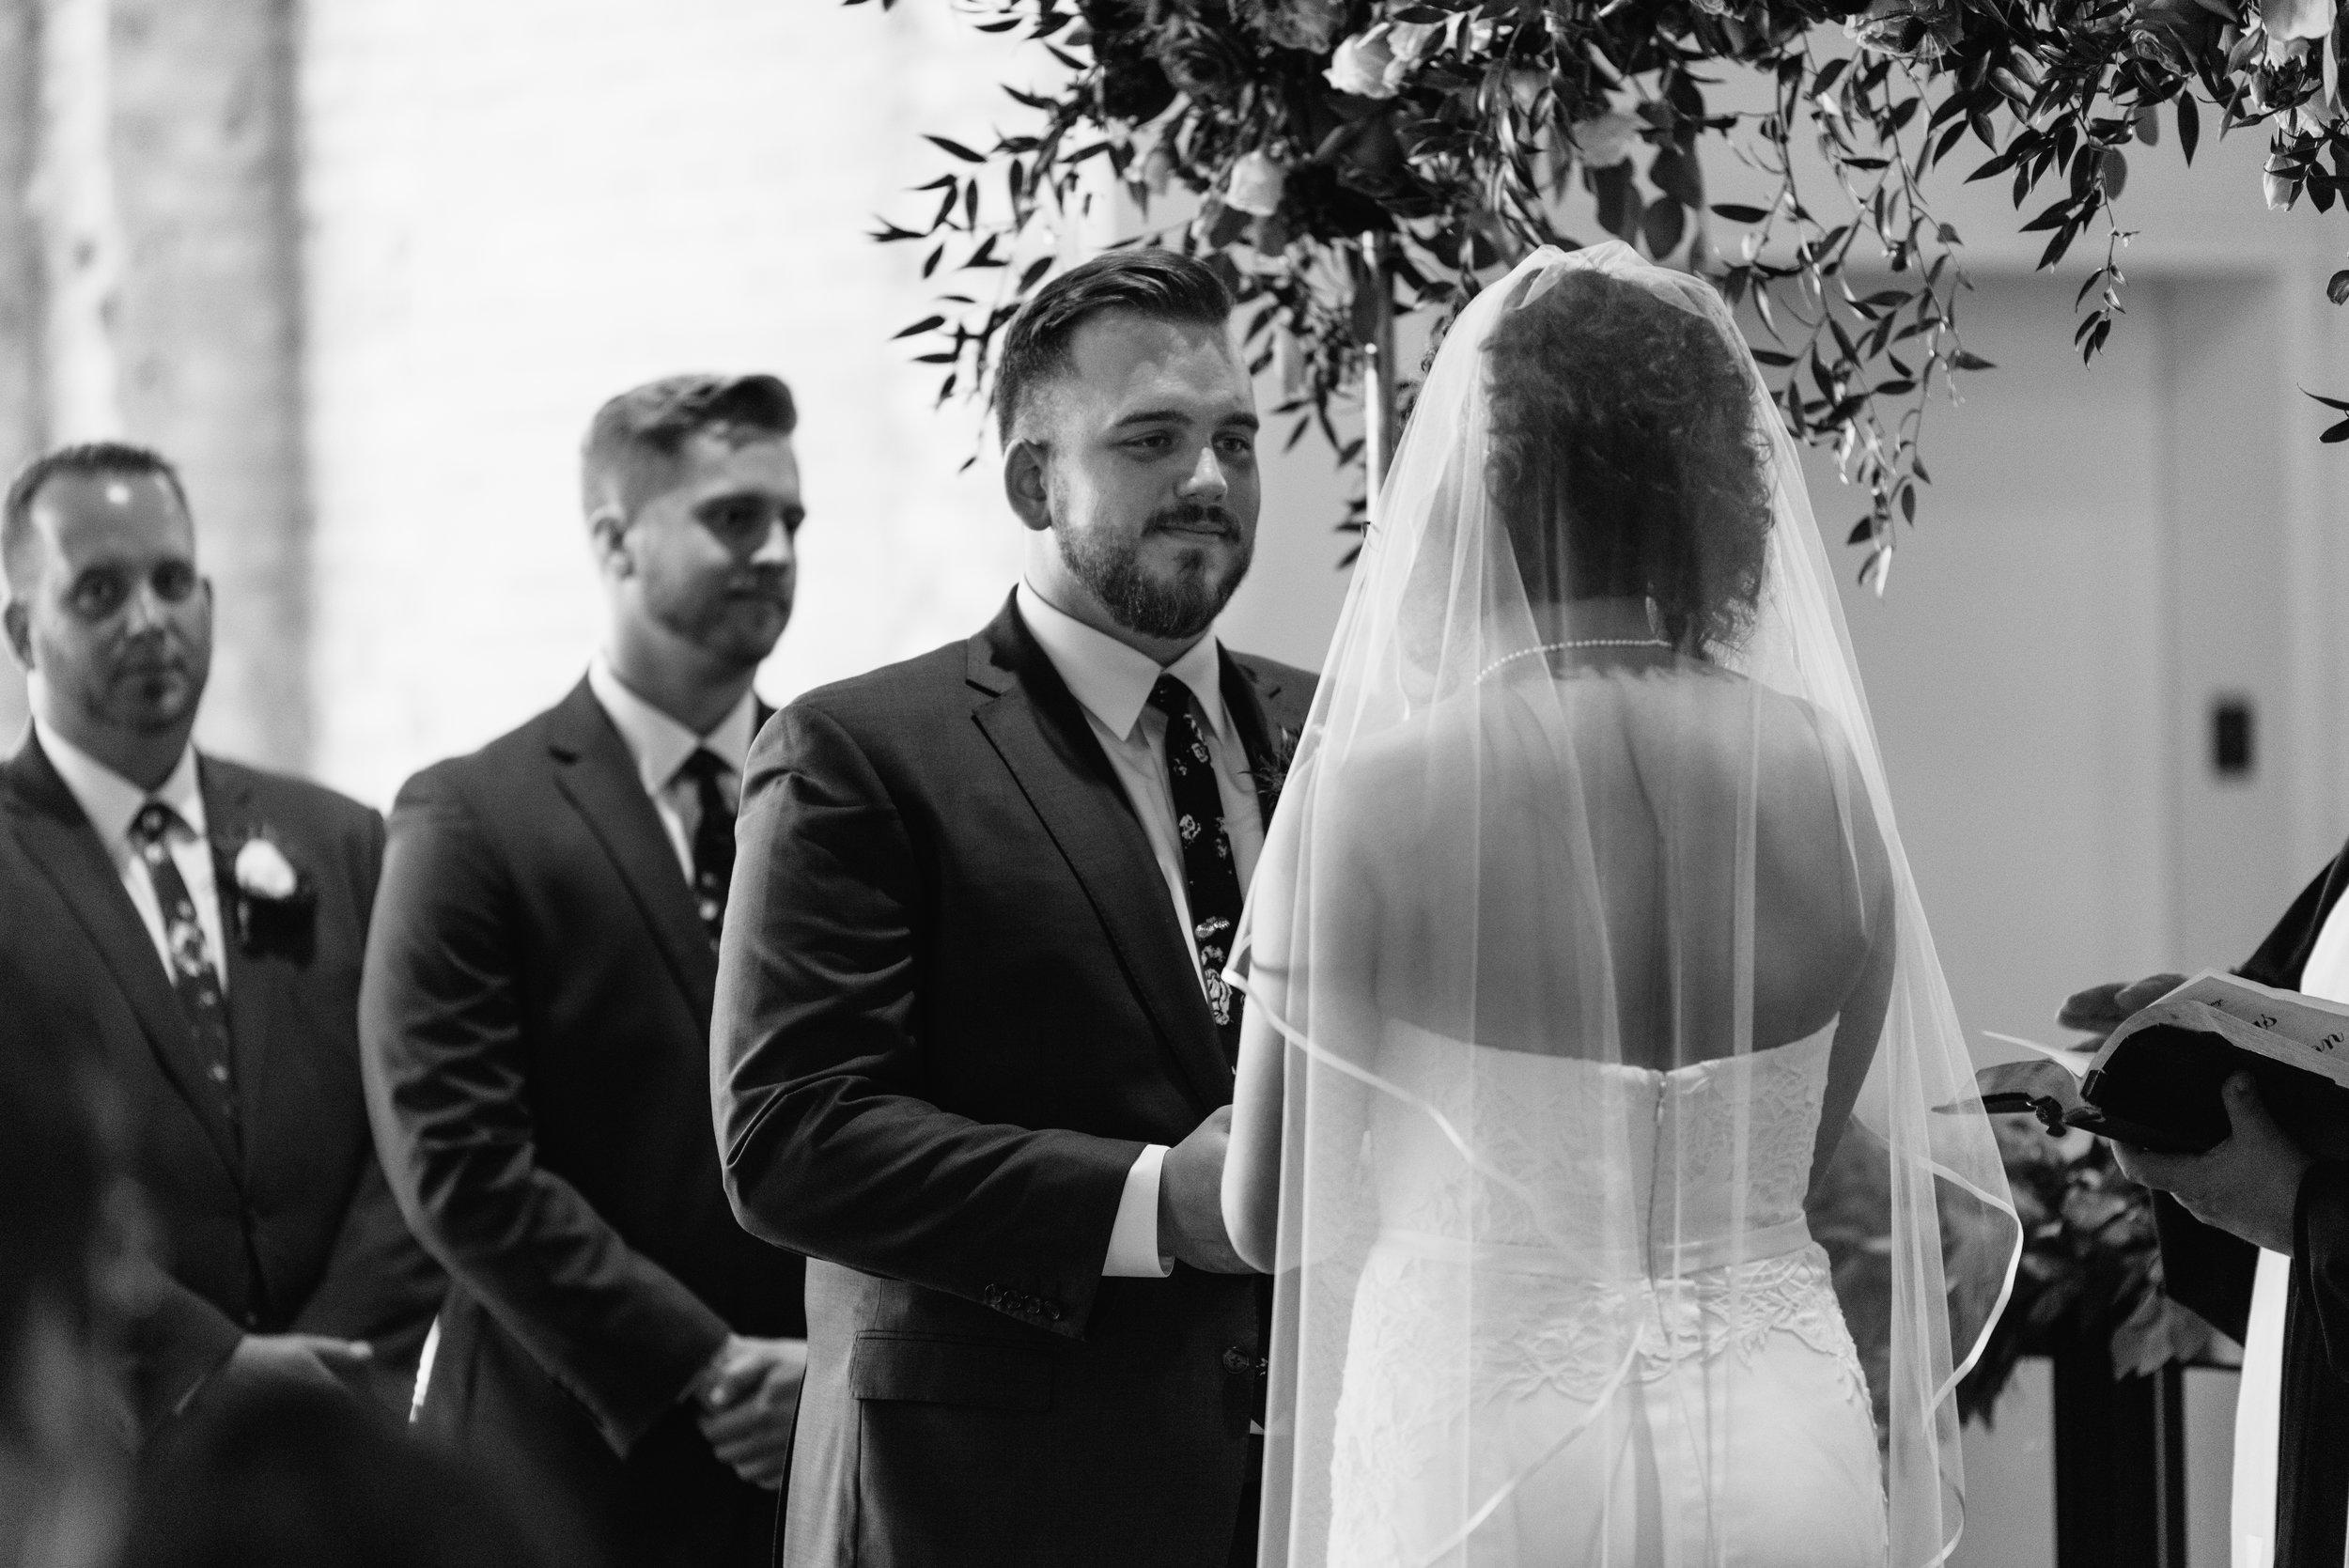 industrial-wedding-minneapolis-photographer-1-14.jpg